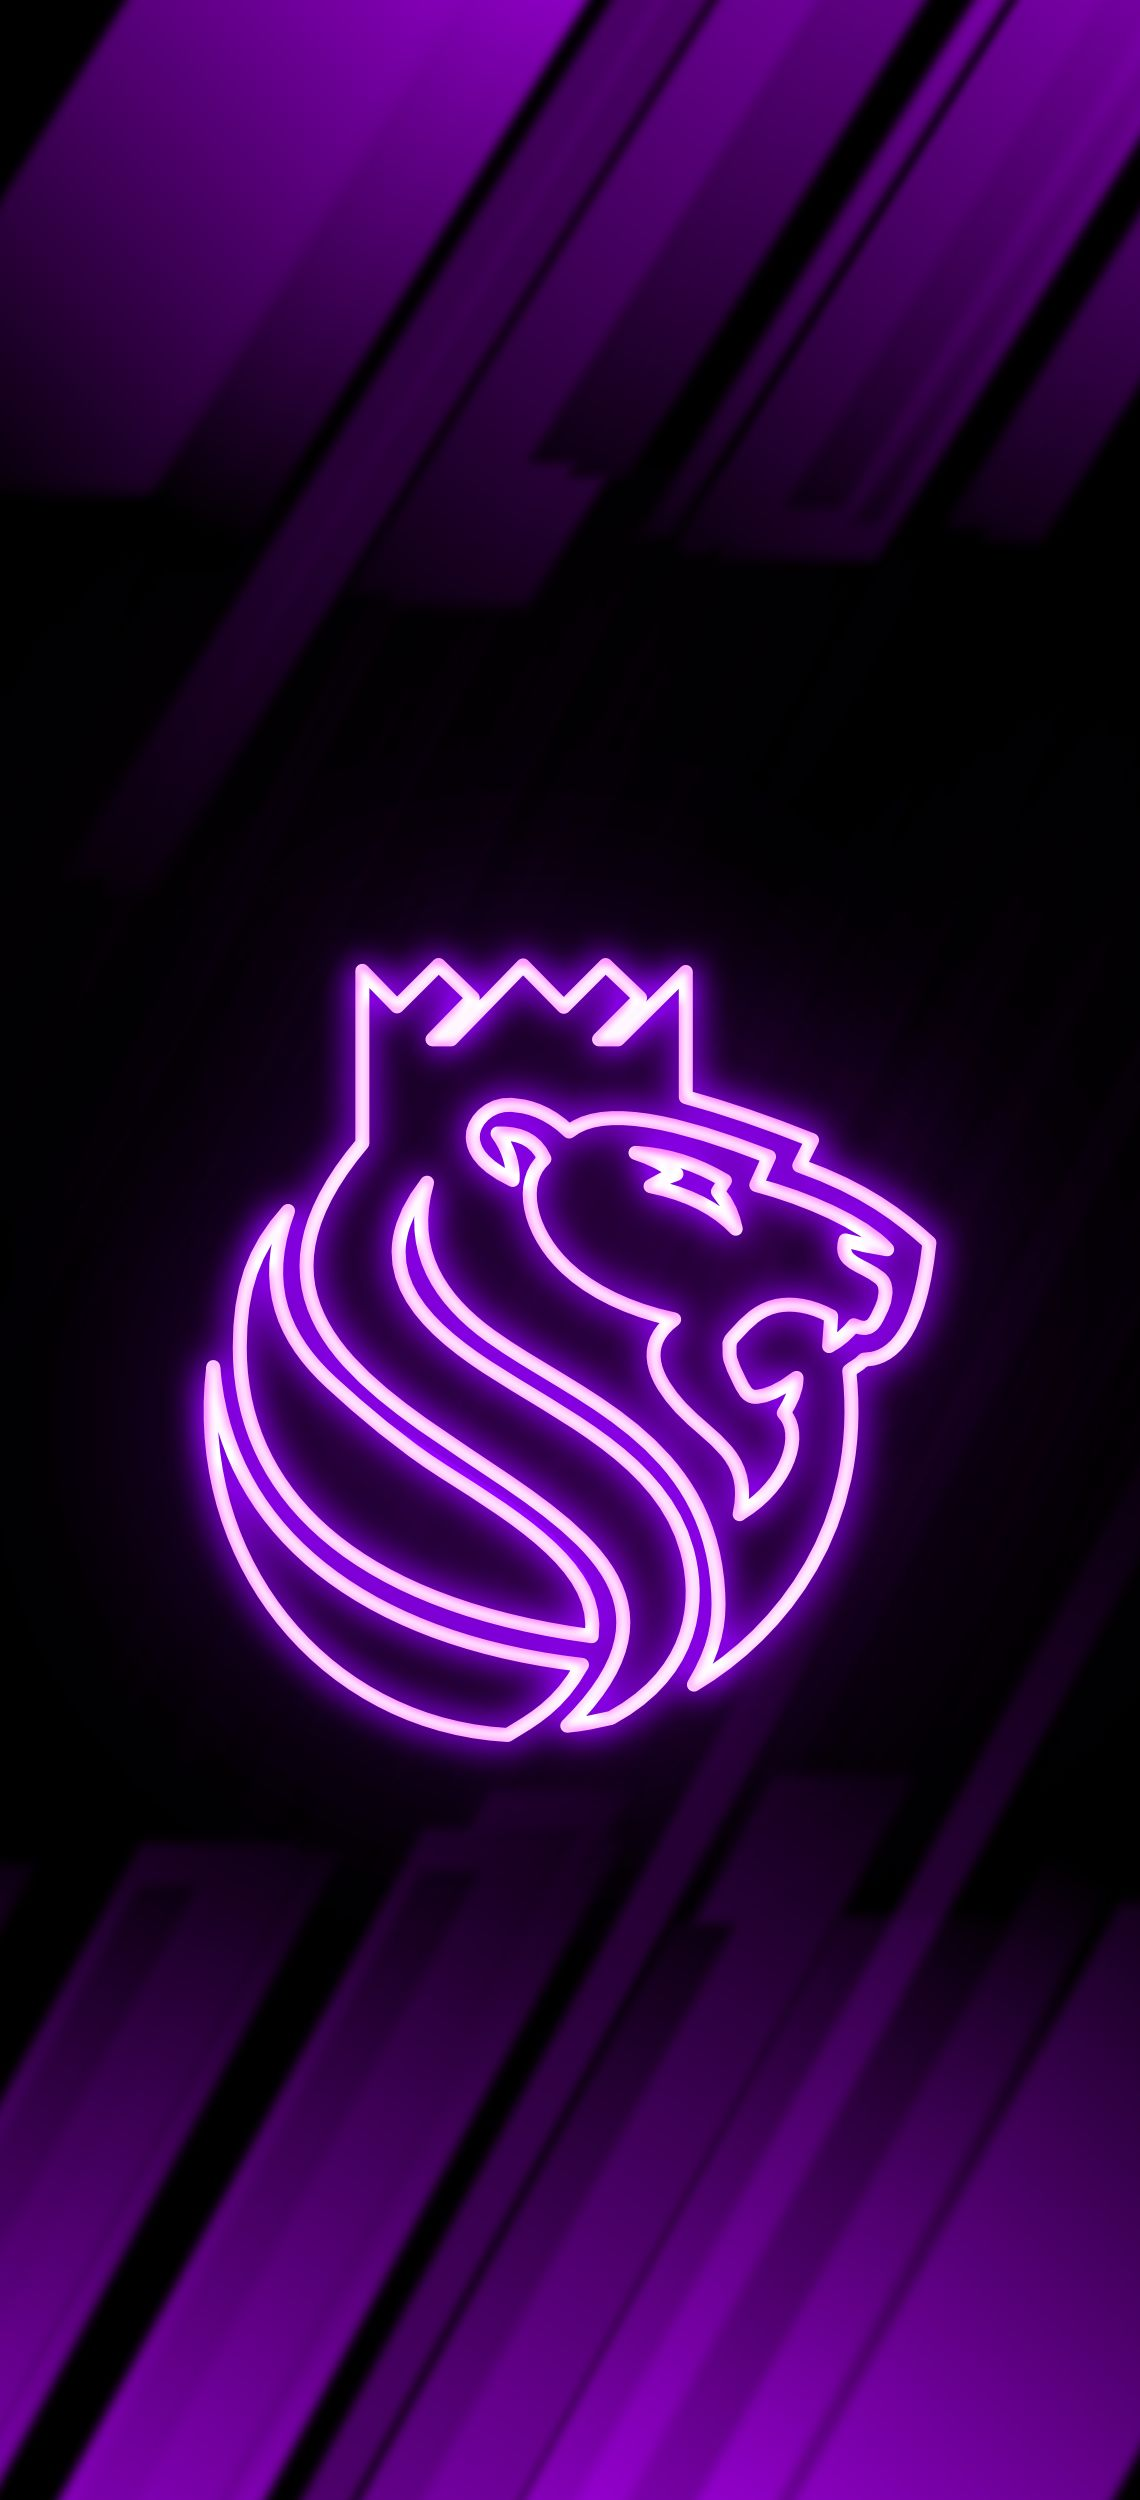 Sacramento Kings Neon Wallpaper Sacramento Kings Basketball Iphone Wallpaper Nba Basketball Teams